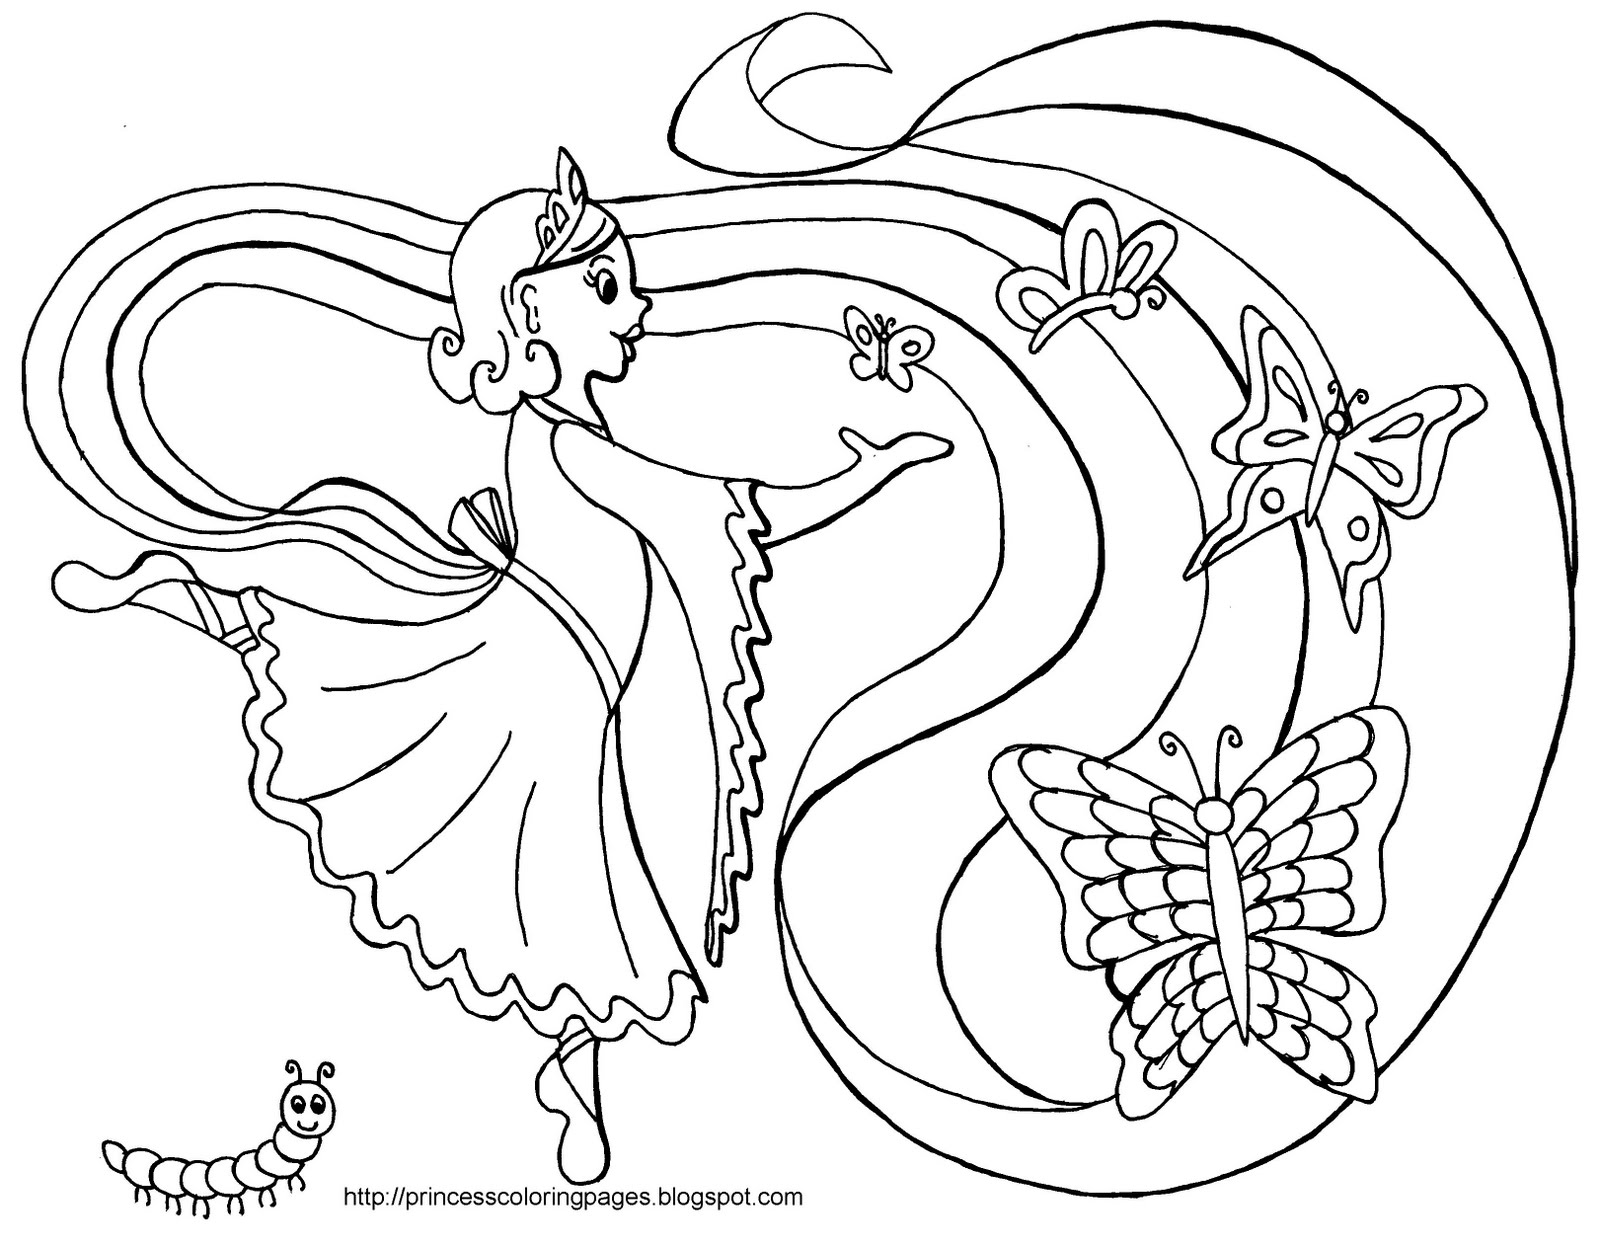 Dora Snow Princess Coloring Pack Nick Jr  - princess coloring pictures